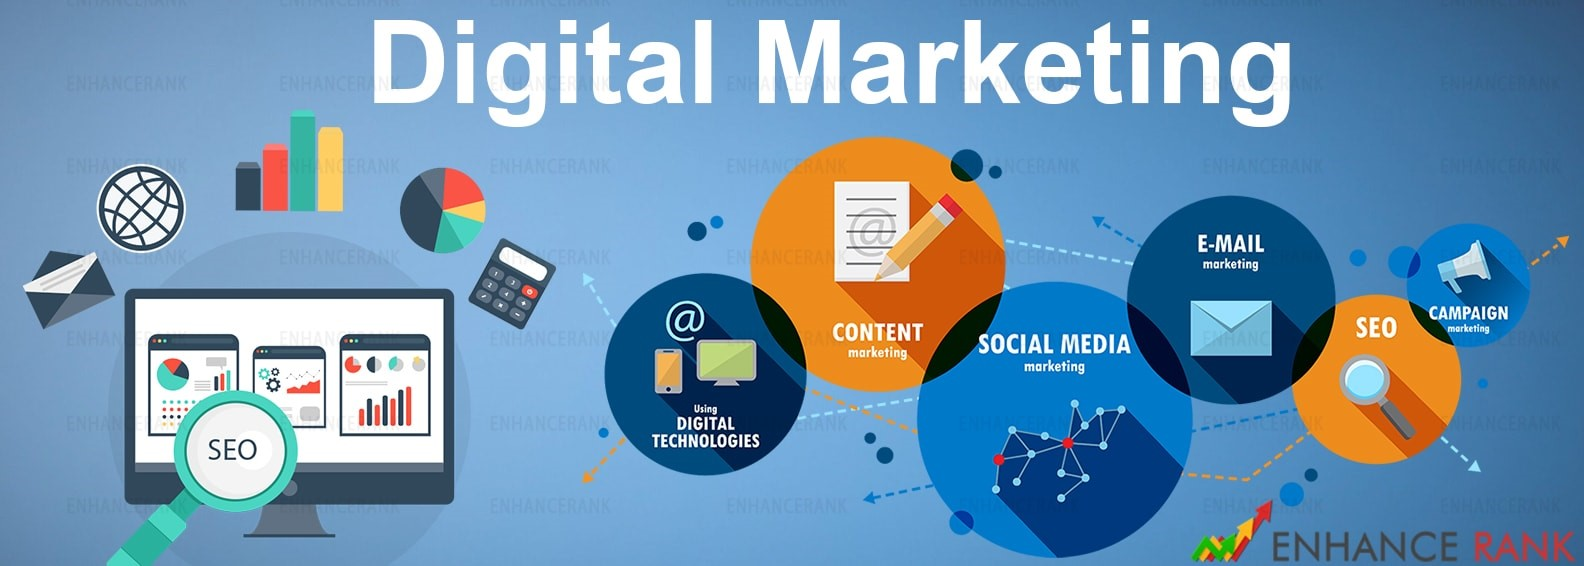 concept-of-digital-marketing